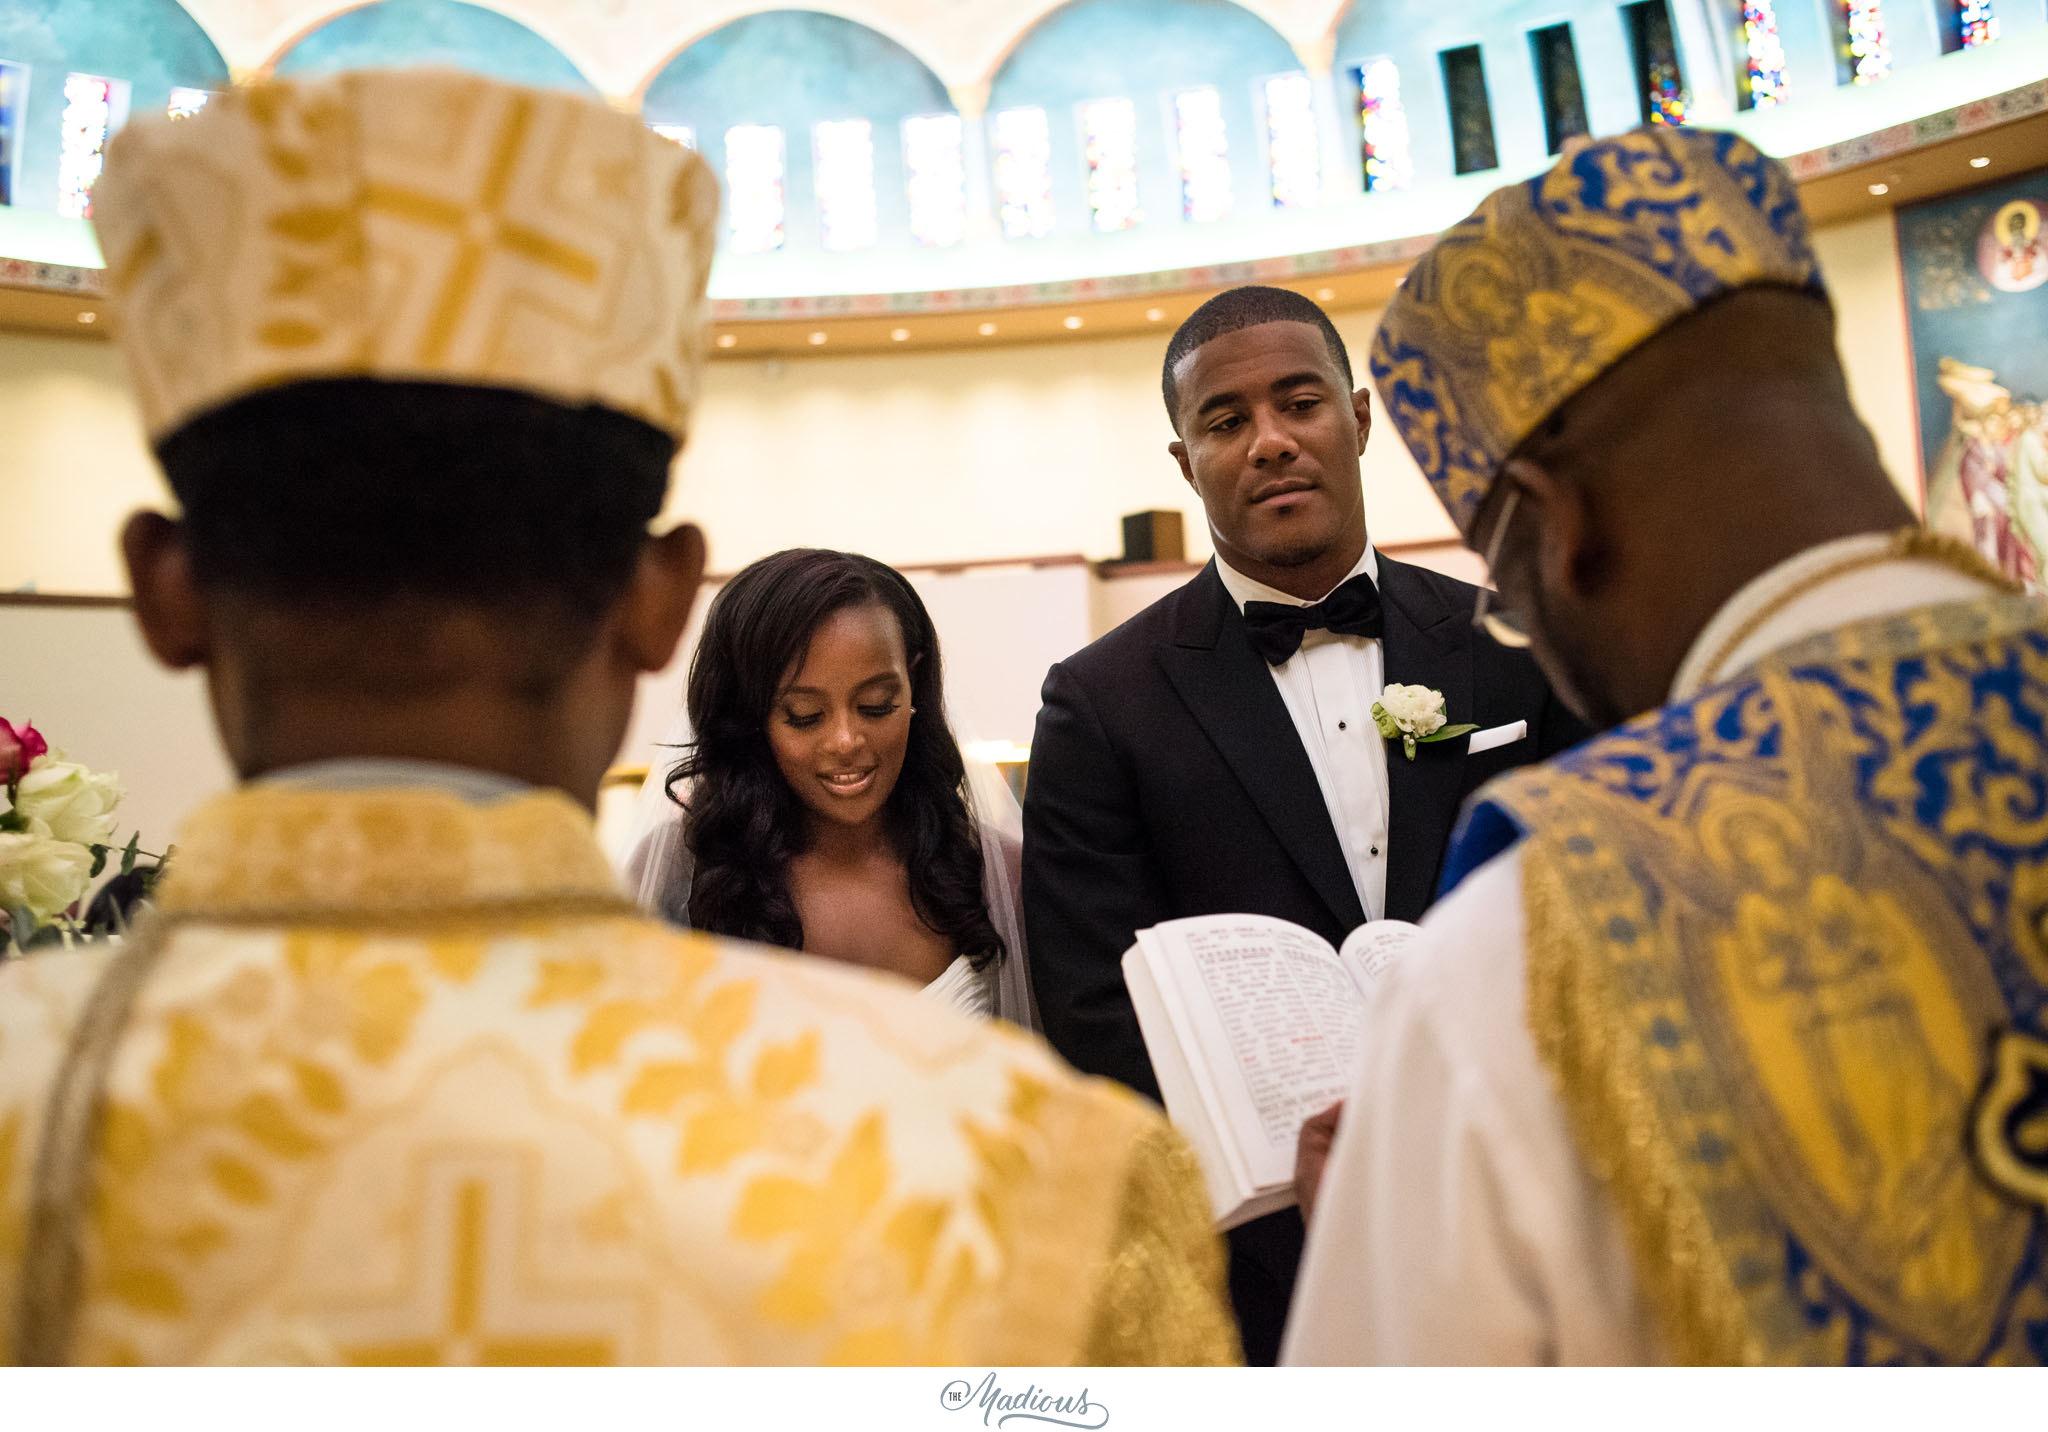 nmwa+wedding,+women+in+the+arts+wedding,+ethiopian+wedding,+dc+wedding+0085.jpg